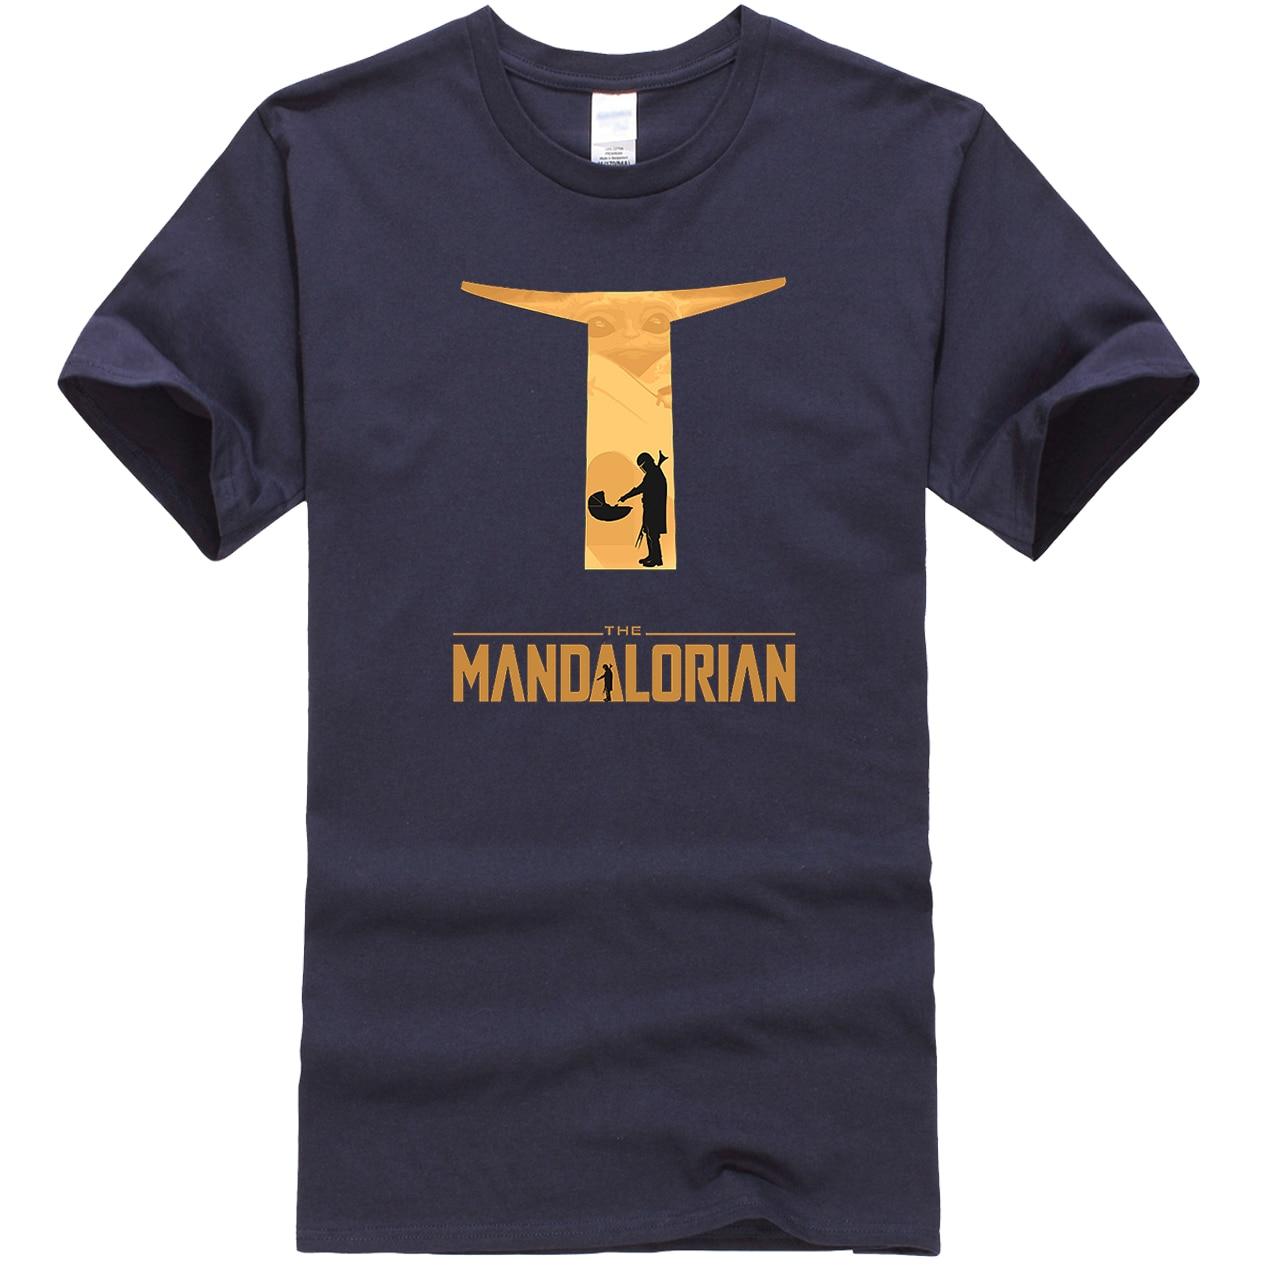 The Mandalorian Hip Hop Men T-Shirts Casual Star Wars Tops New Summer 2020 Cotton Baby Yoda T Shirt High Quality Male T-Shirt